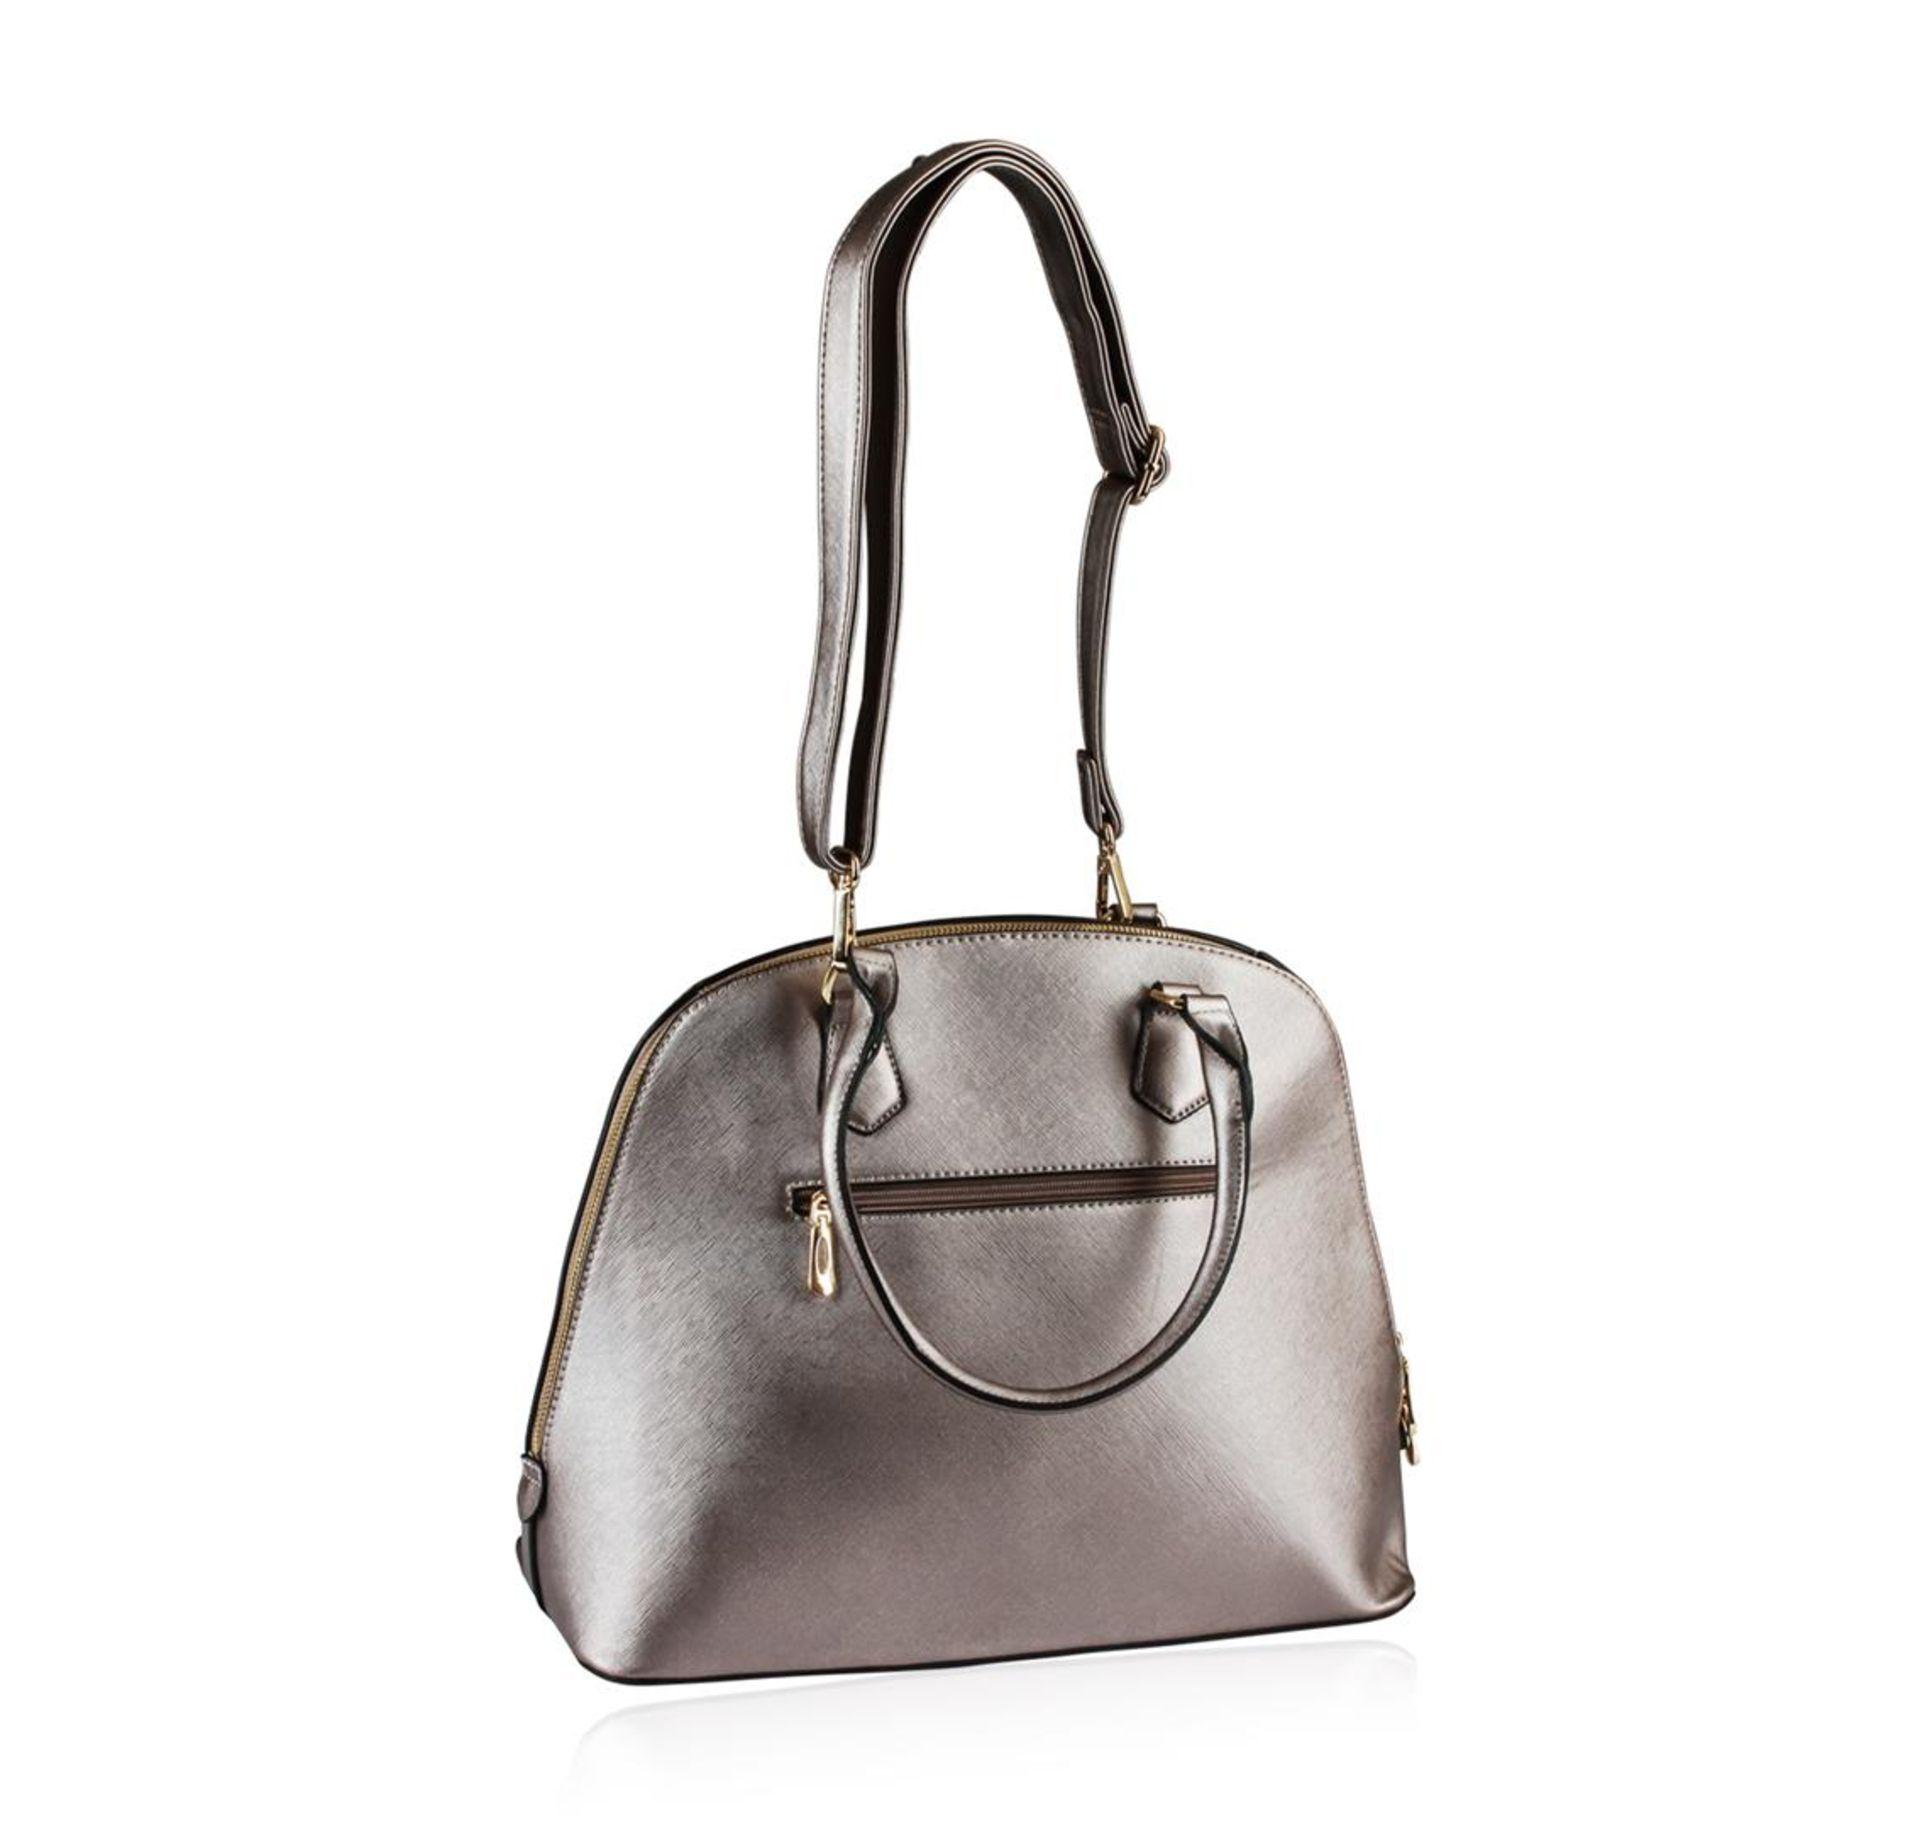 Metallic Silver Rush Handbag - Image 3 of 3